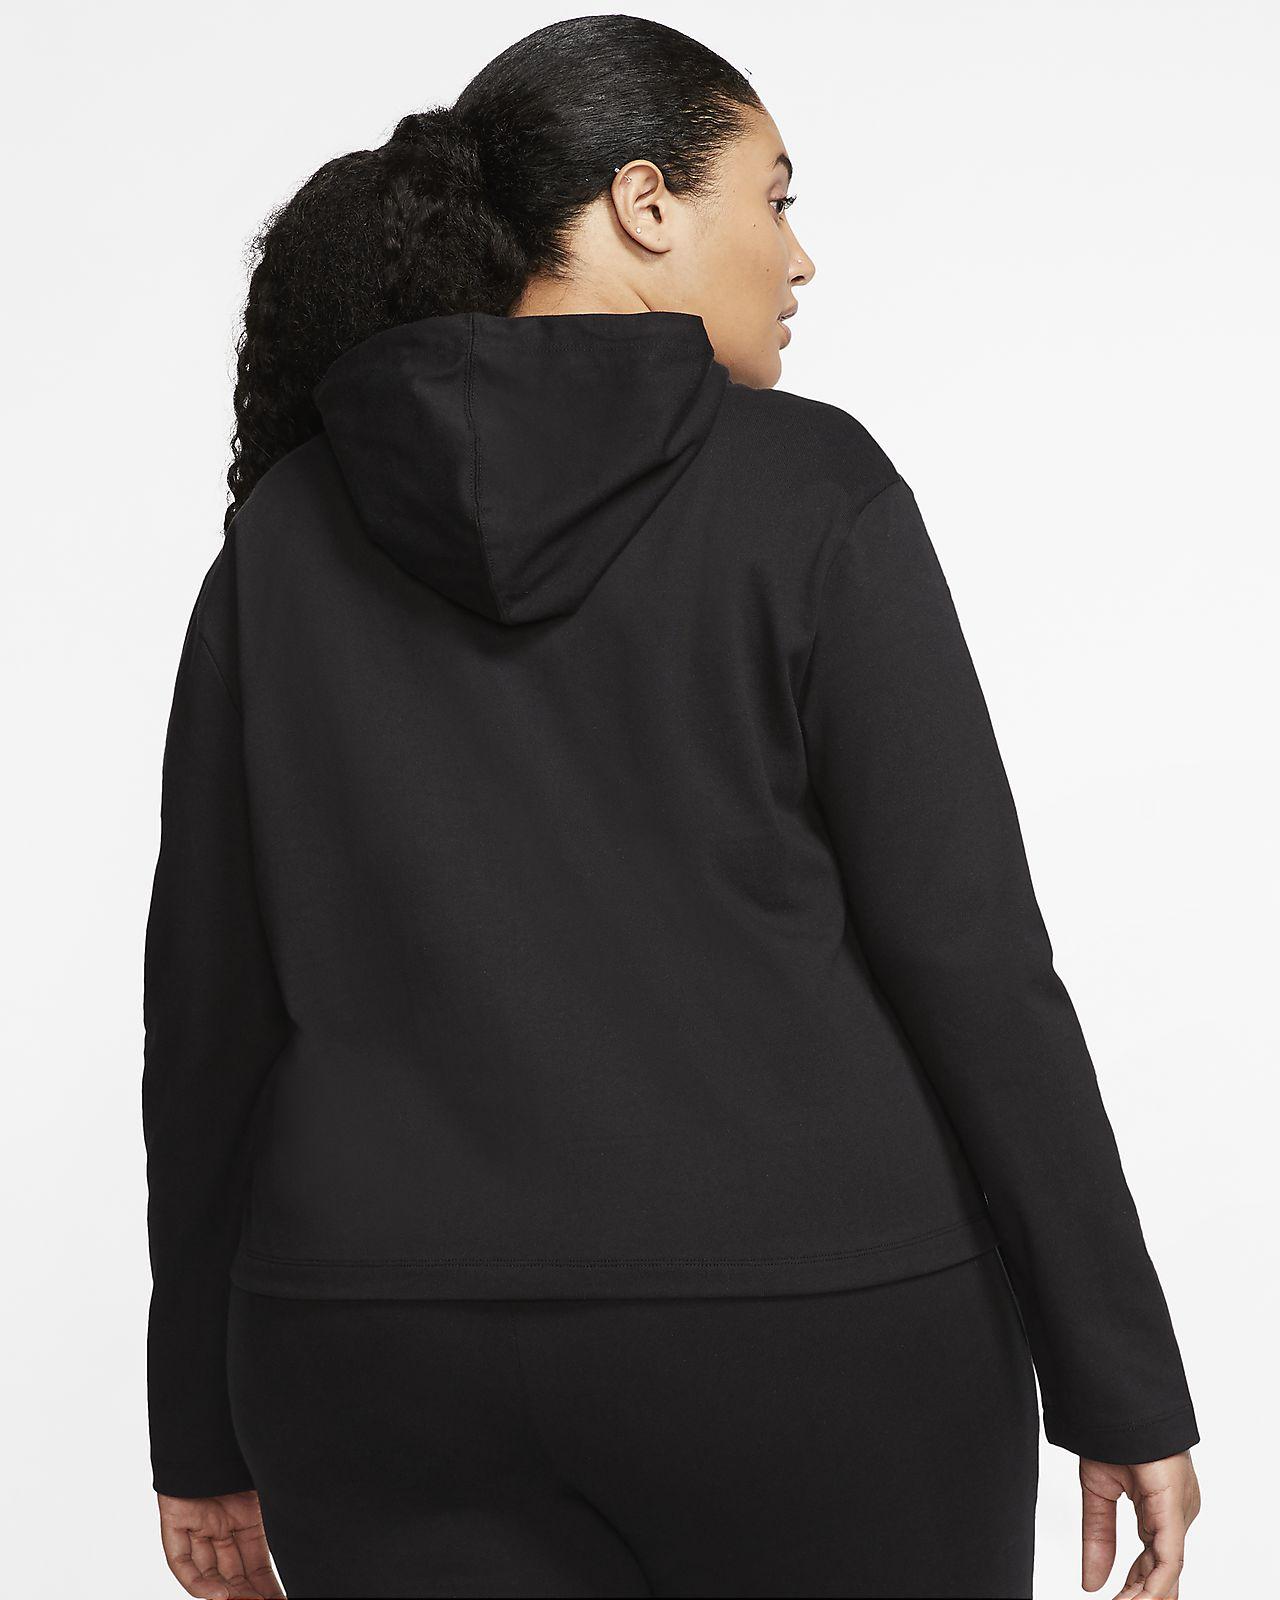 Nike Sportswear hosszú cipzáras, kapucnis női pulóver (plus size méret)